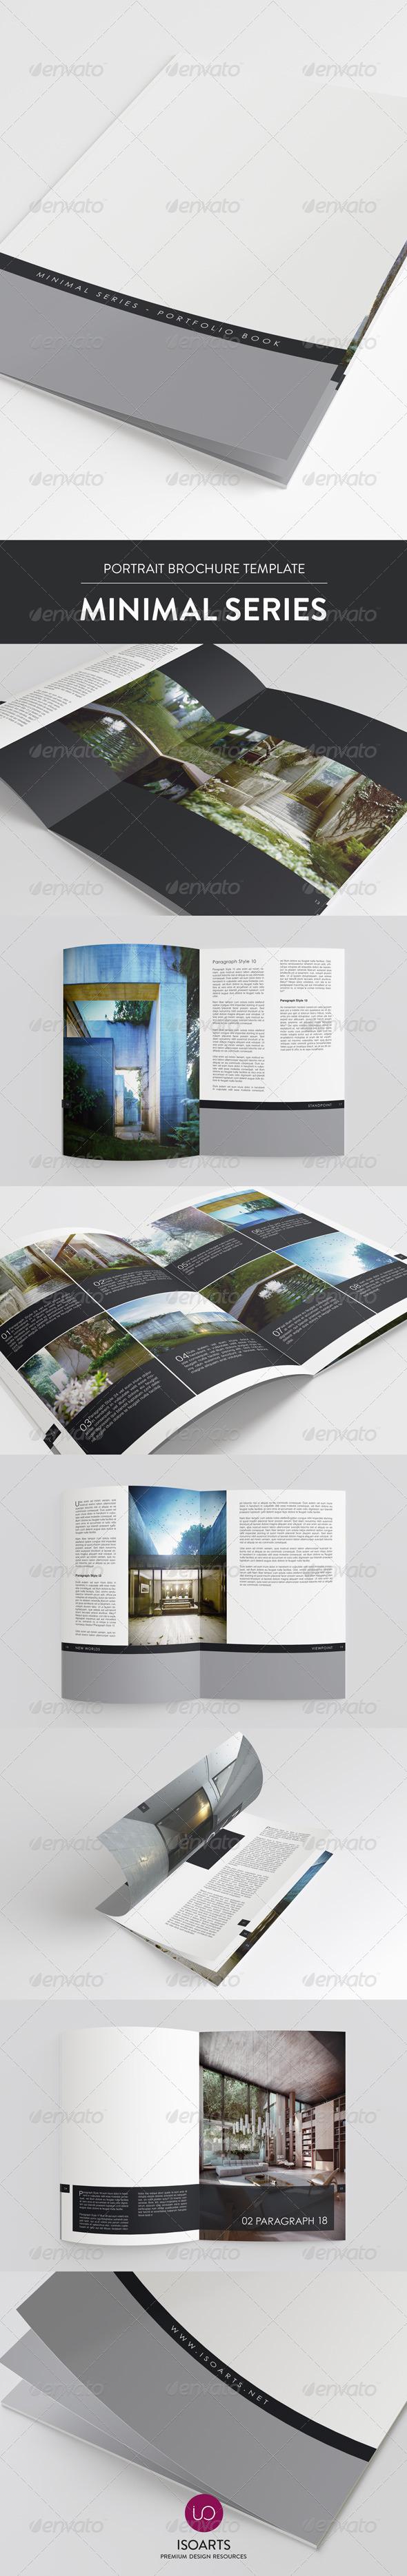 Minimal Series • Portrait Brochure Template - Portfolio Brochures